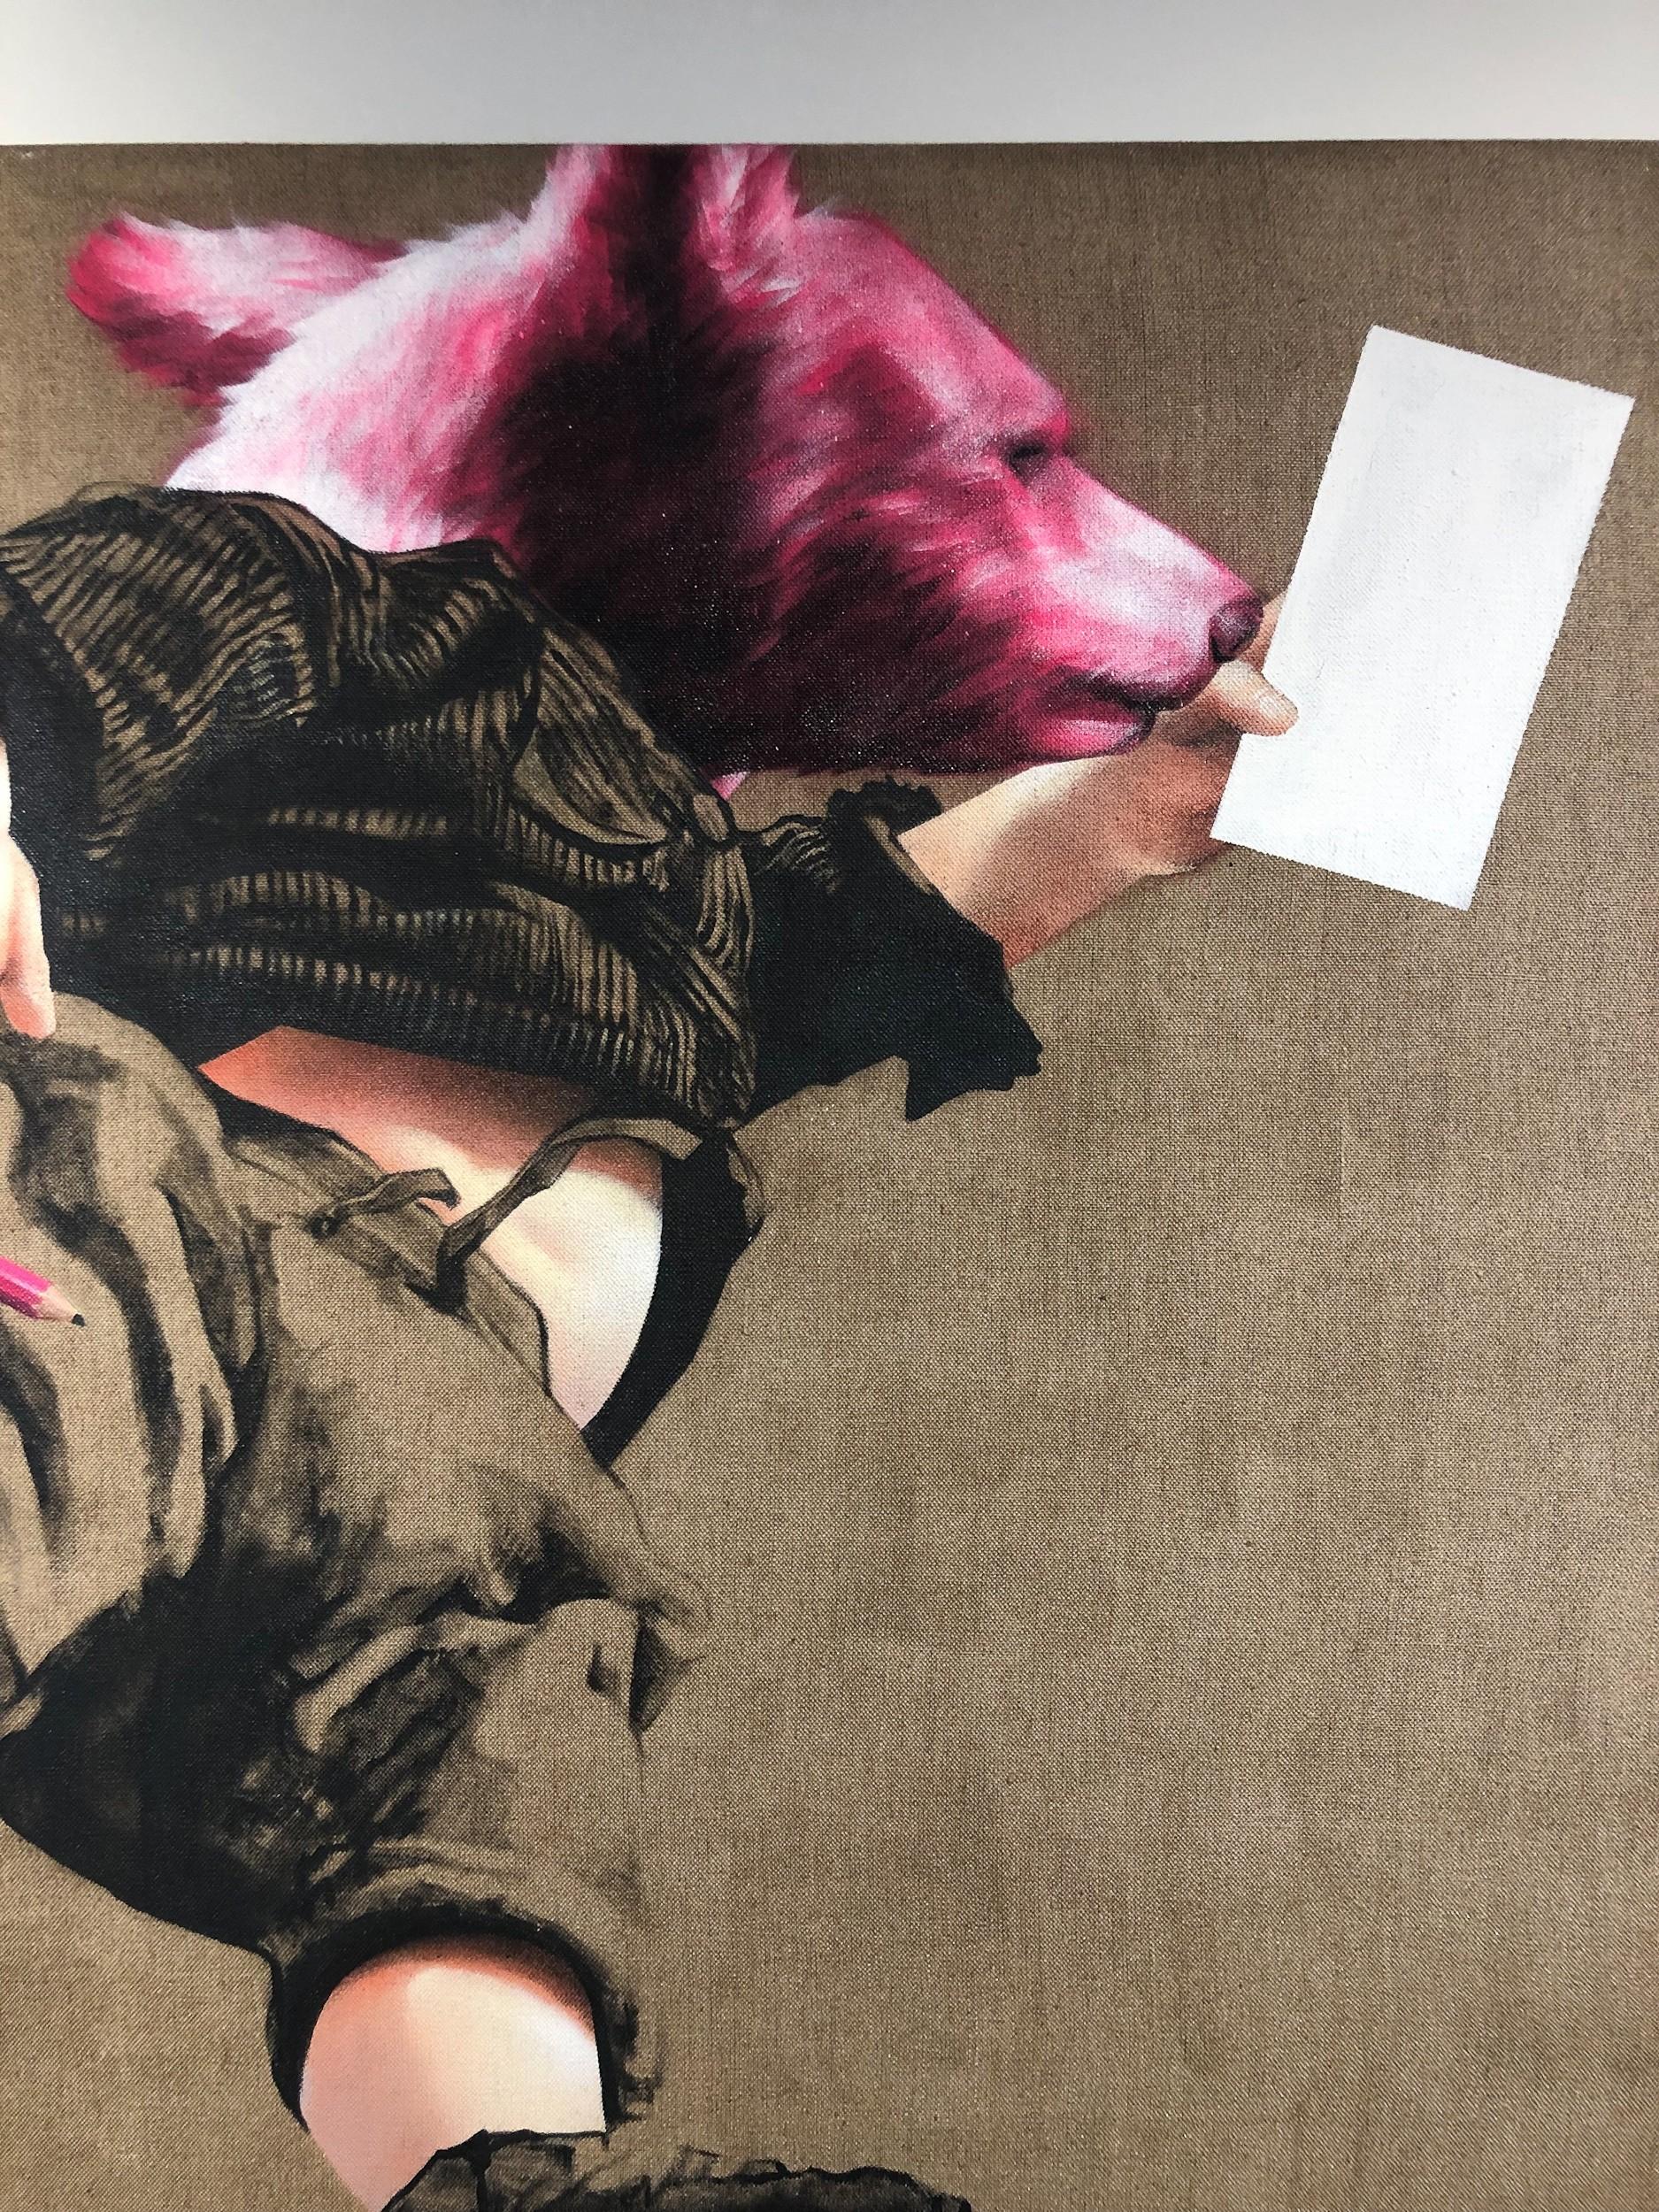 Pflegeleicht | Detail, Malerei von Jakob Tory Bardou, innerfields | Acryl auf Leinwand, Urban Art